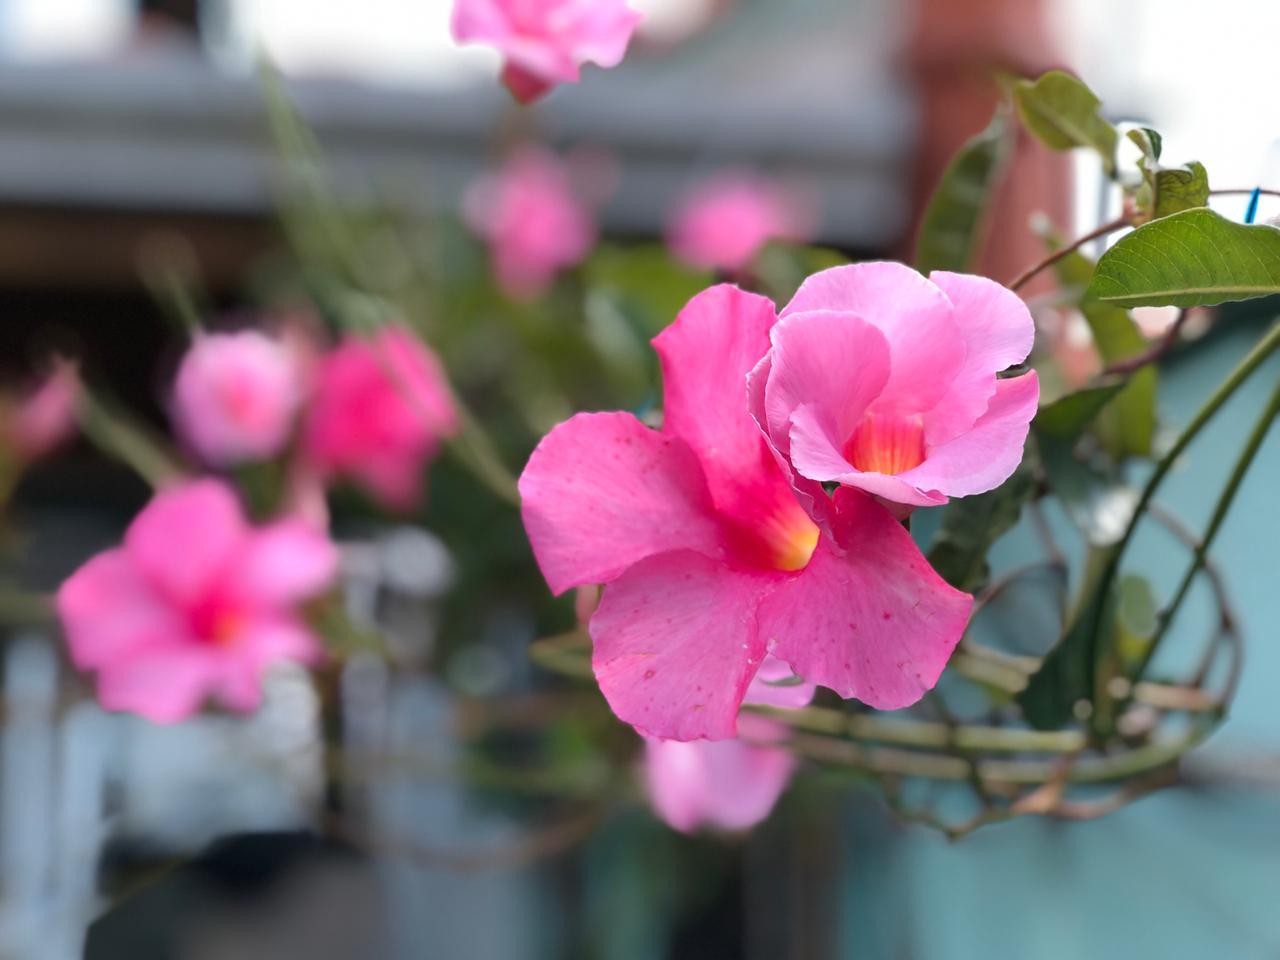 flor rosa2 2019-02-25 at 15.42.31(2)